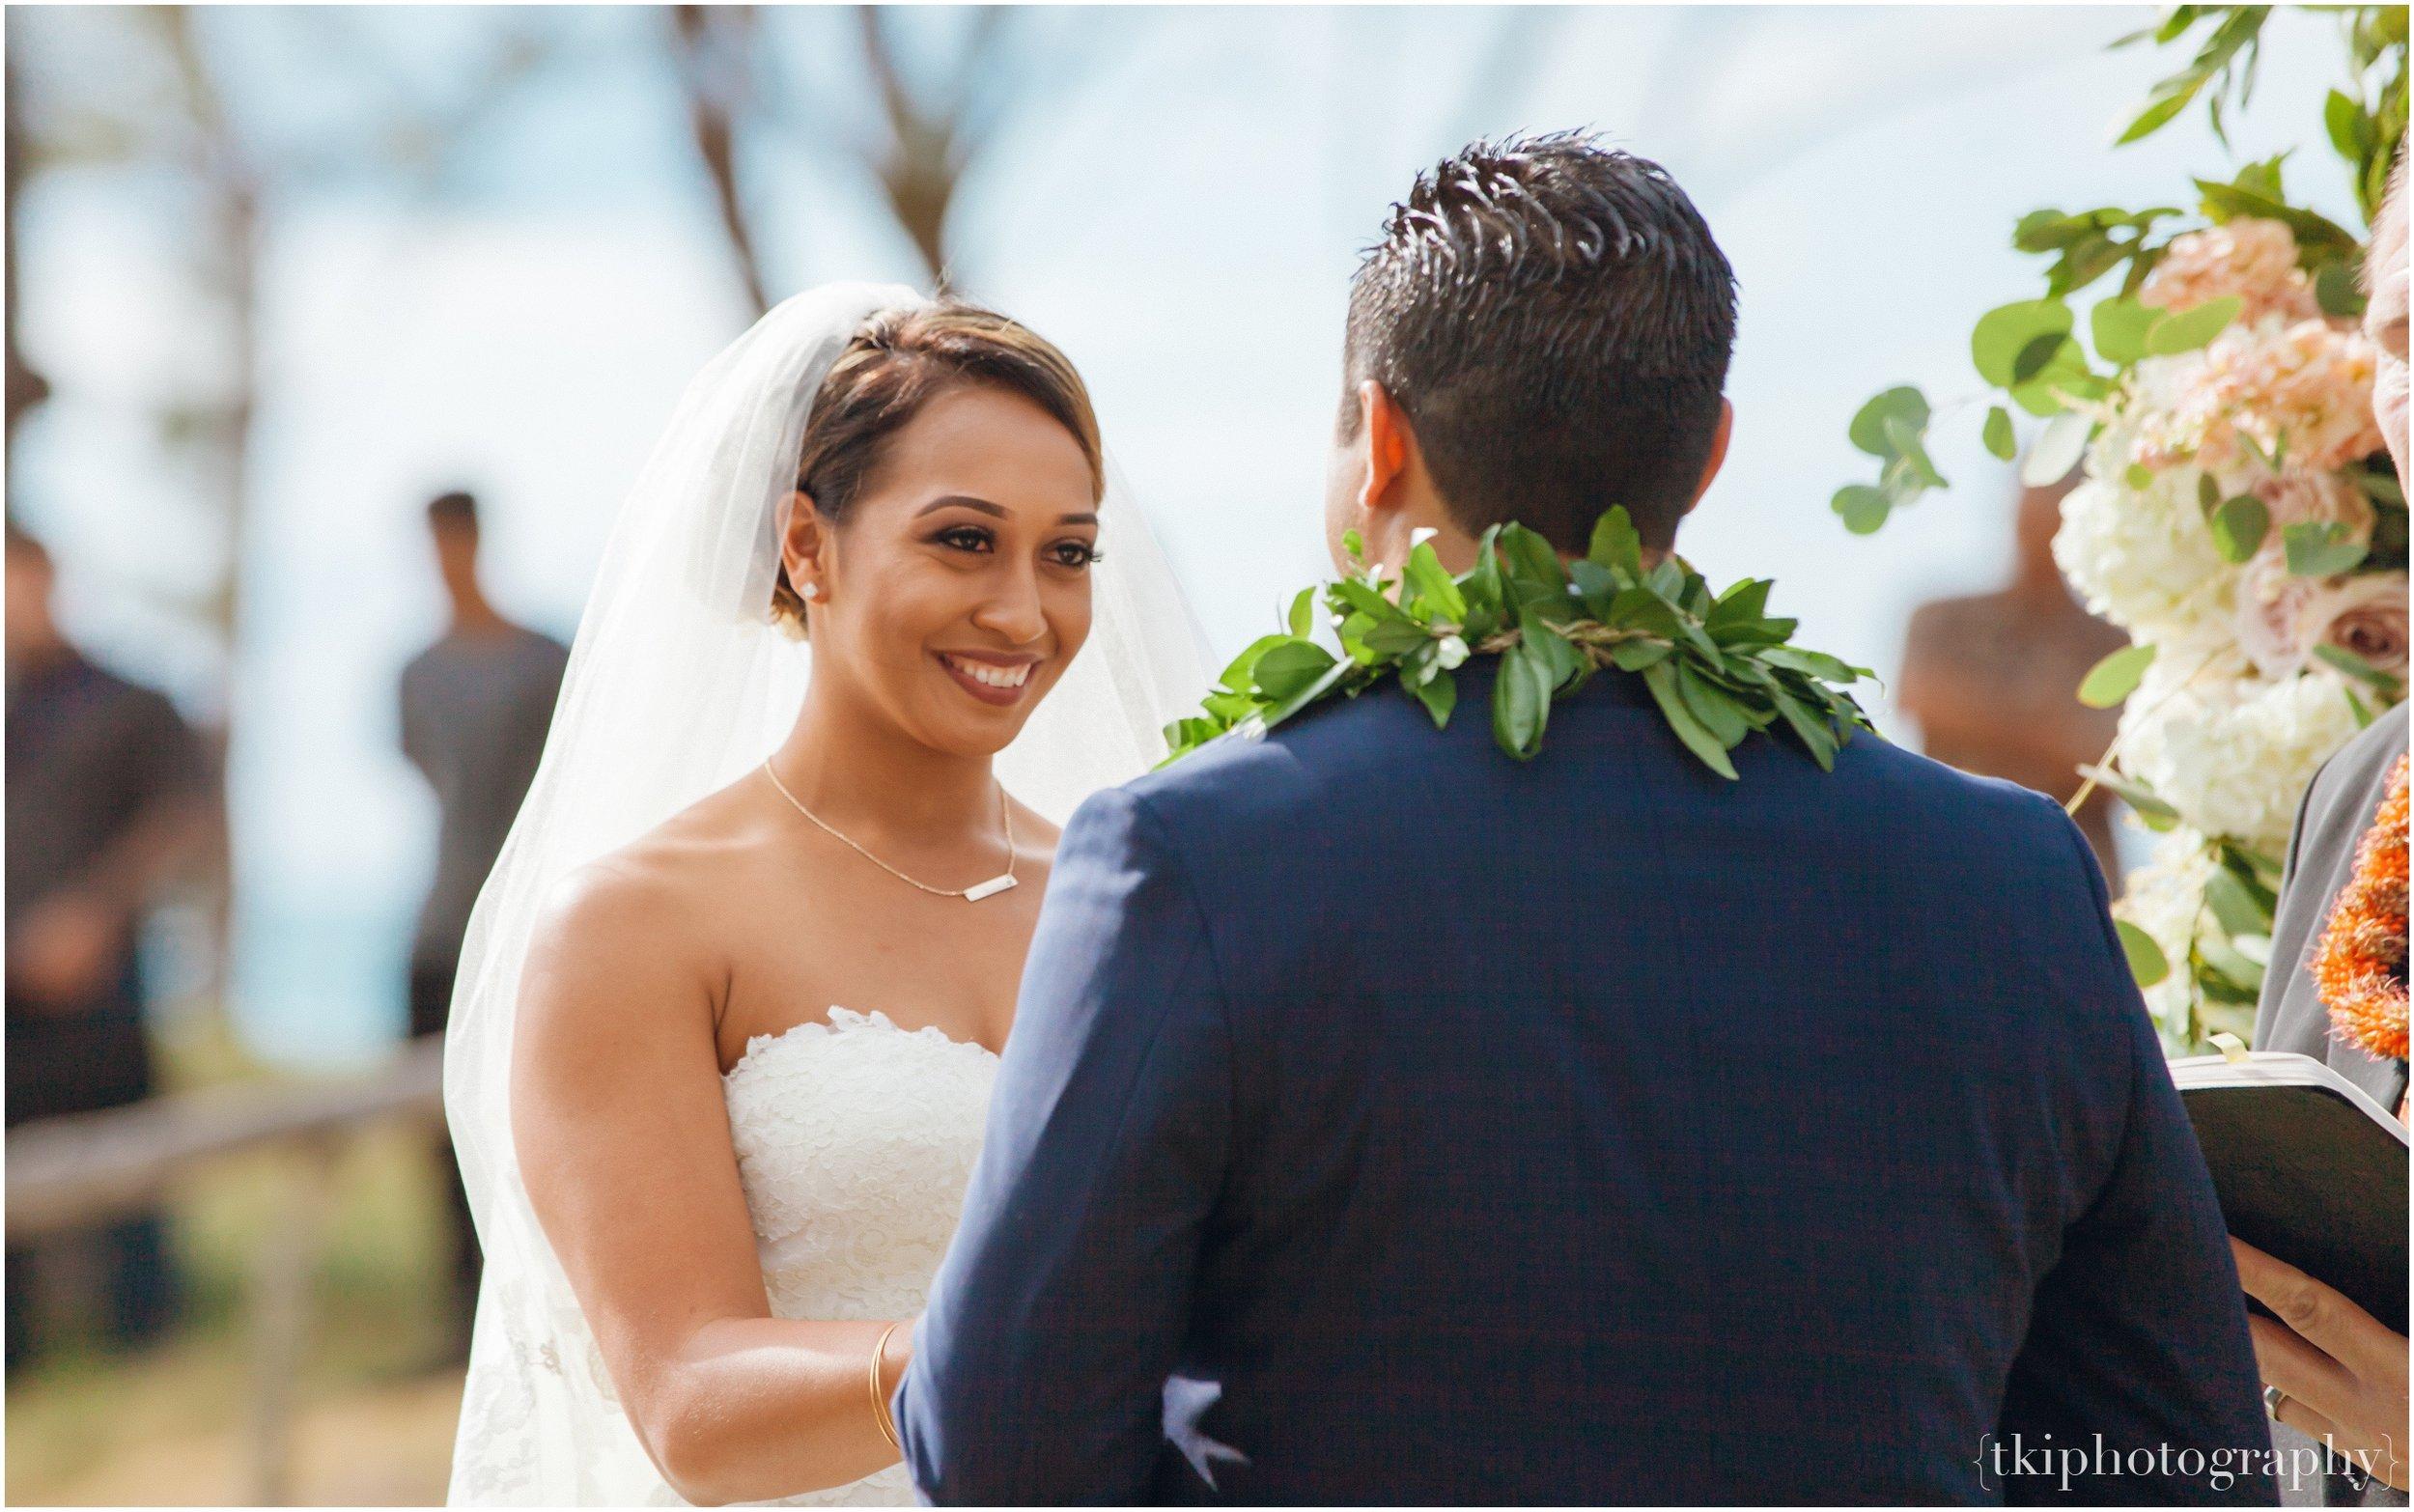 Oahu-Destination-Wedding-Beach_0088.jpg